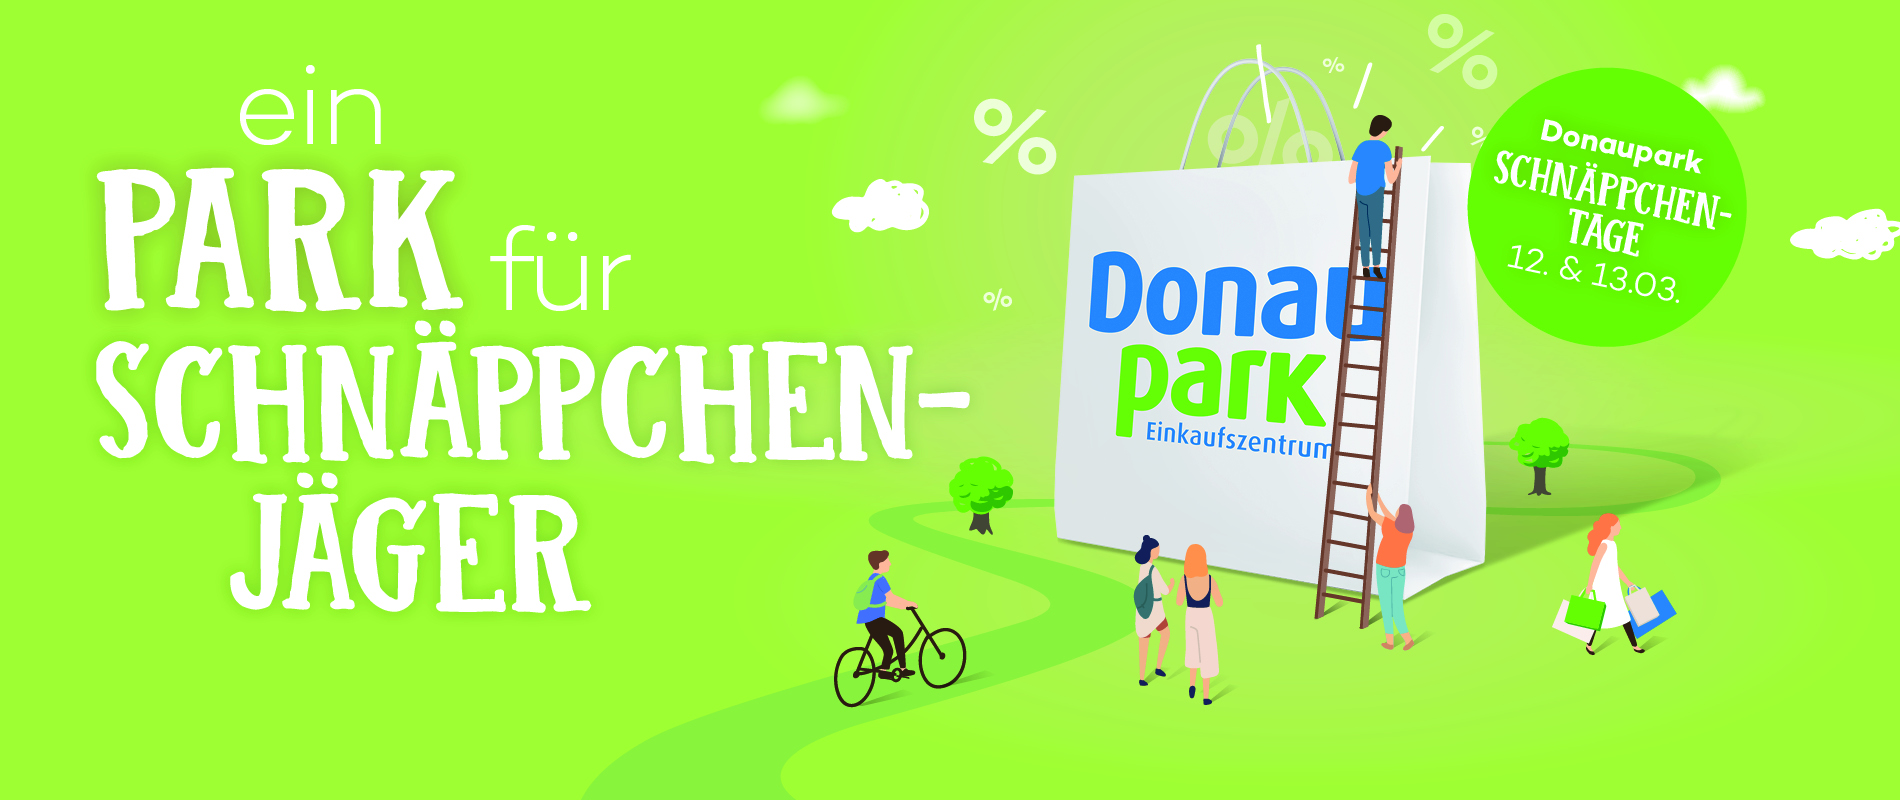 Slider_Bilder_Donaupark